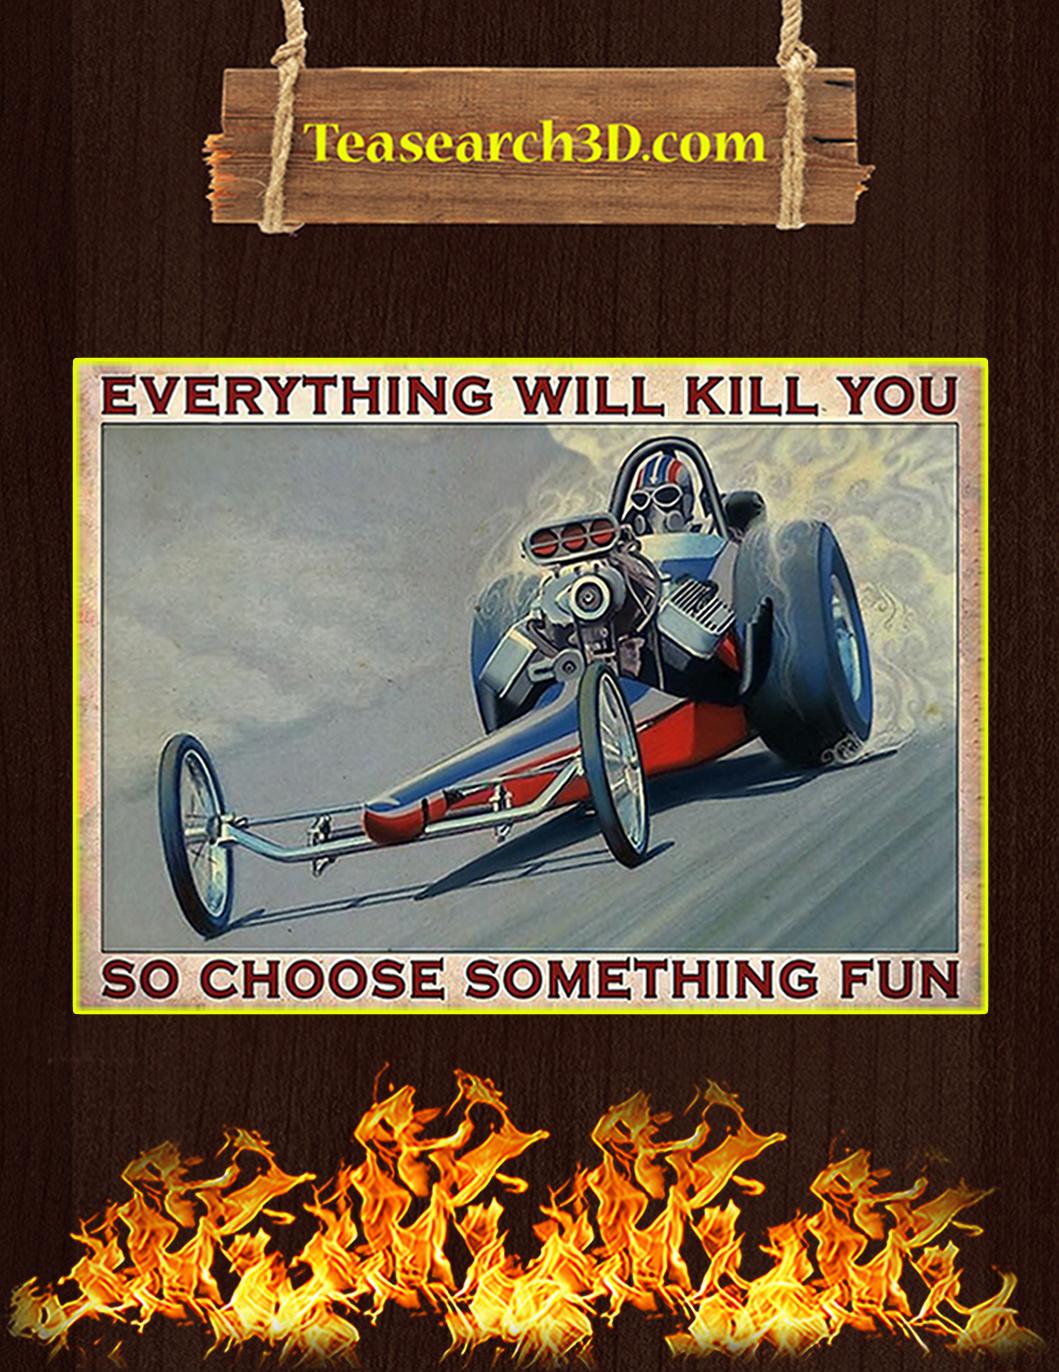 Drag racing so choose something fun poster A1